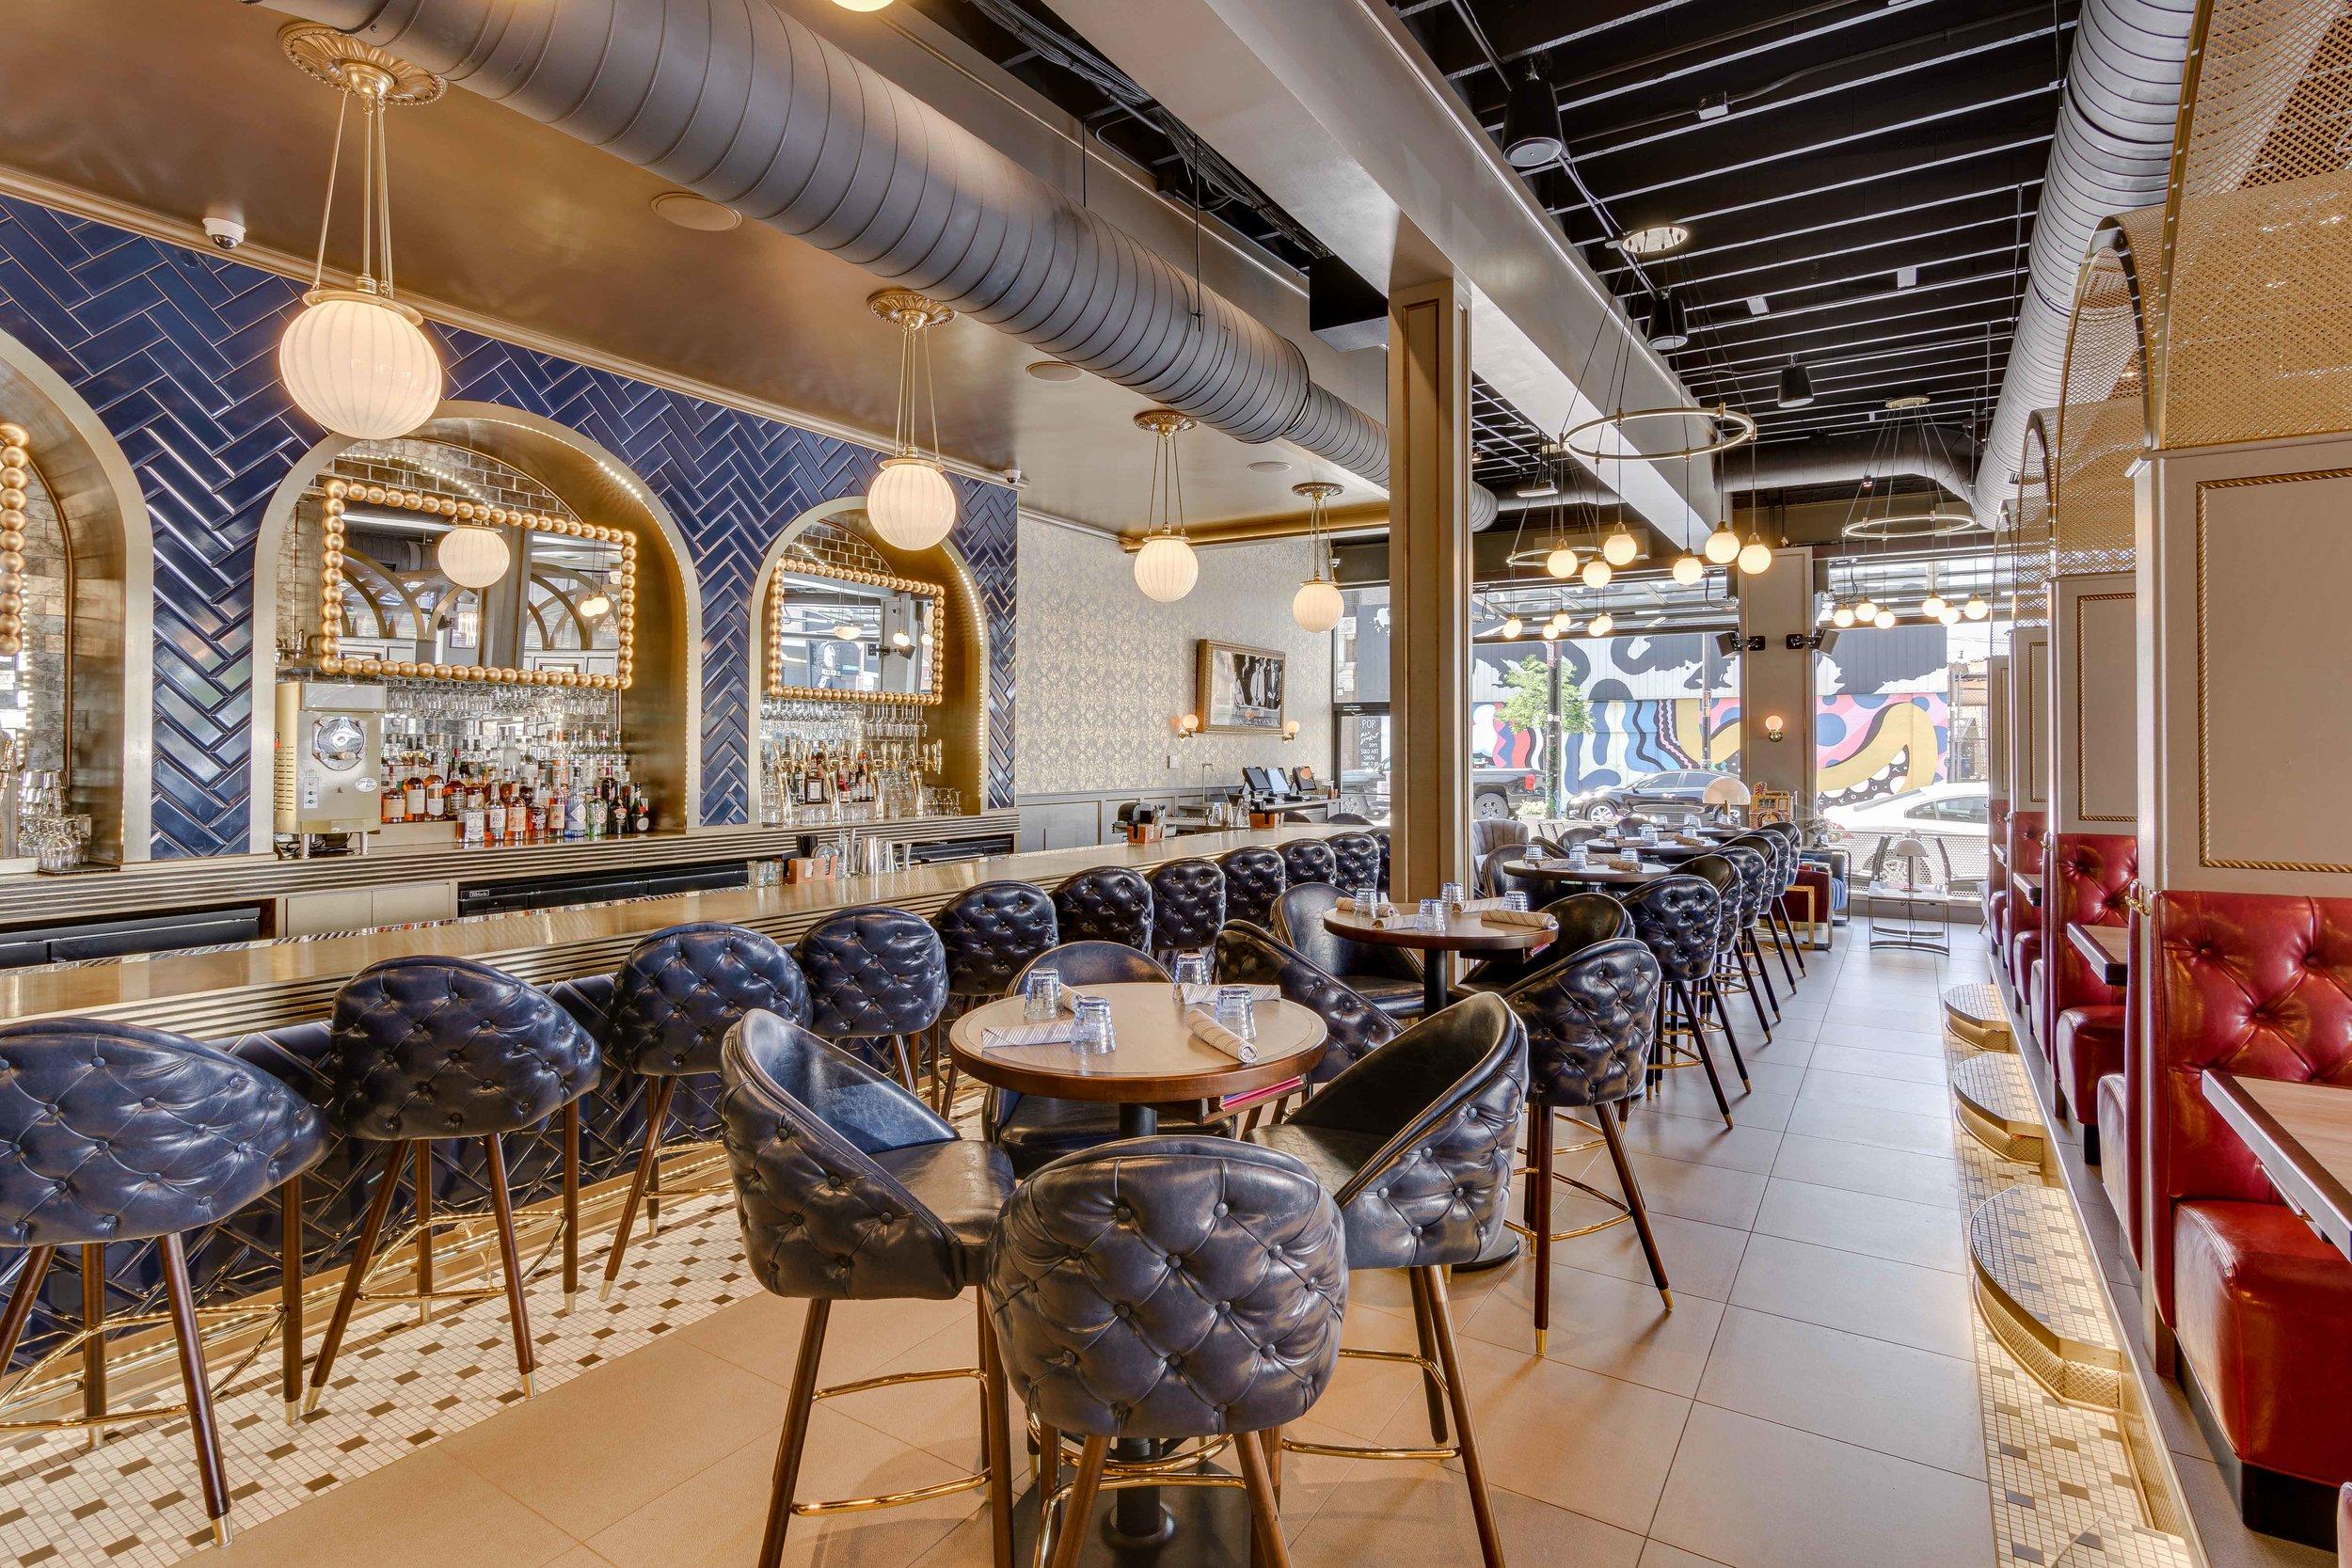 The Whale Restaurant - Web_049.jpg